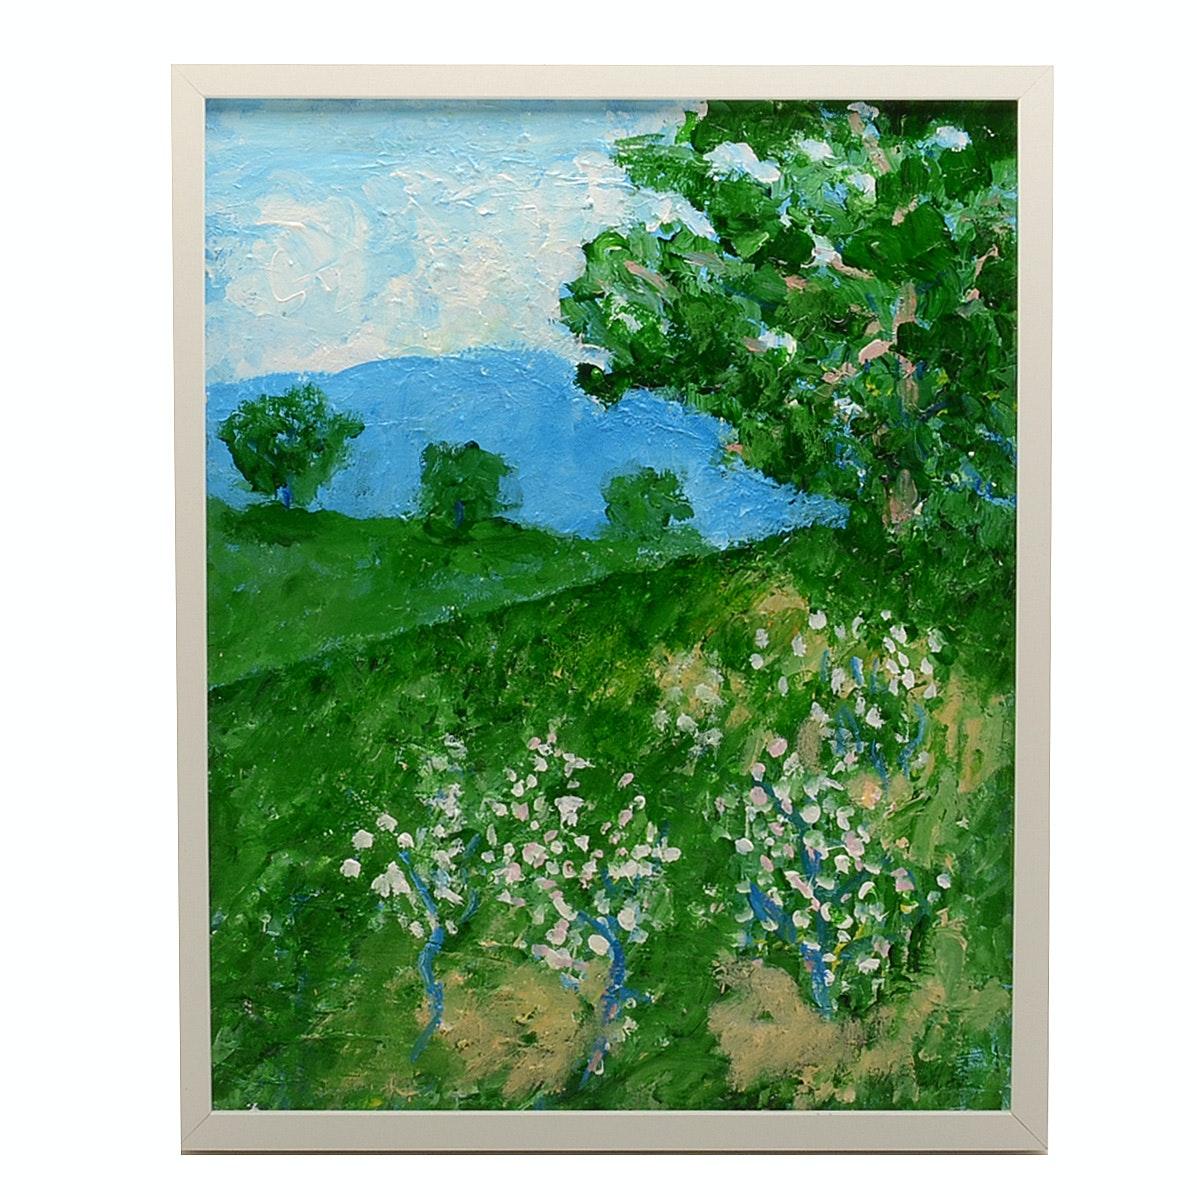 William Becker Original Acrylic Painting on Canvas